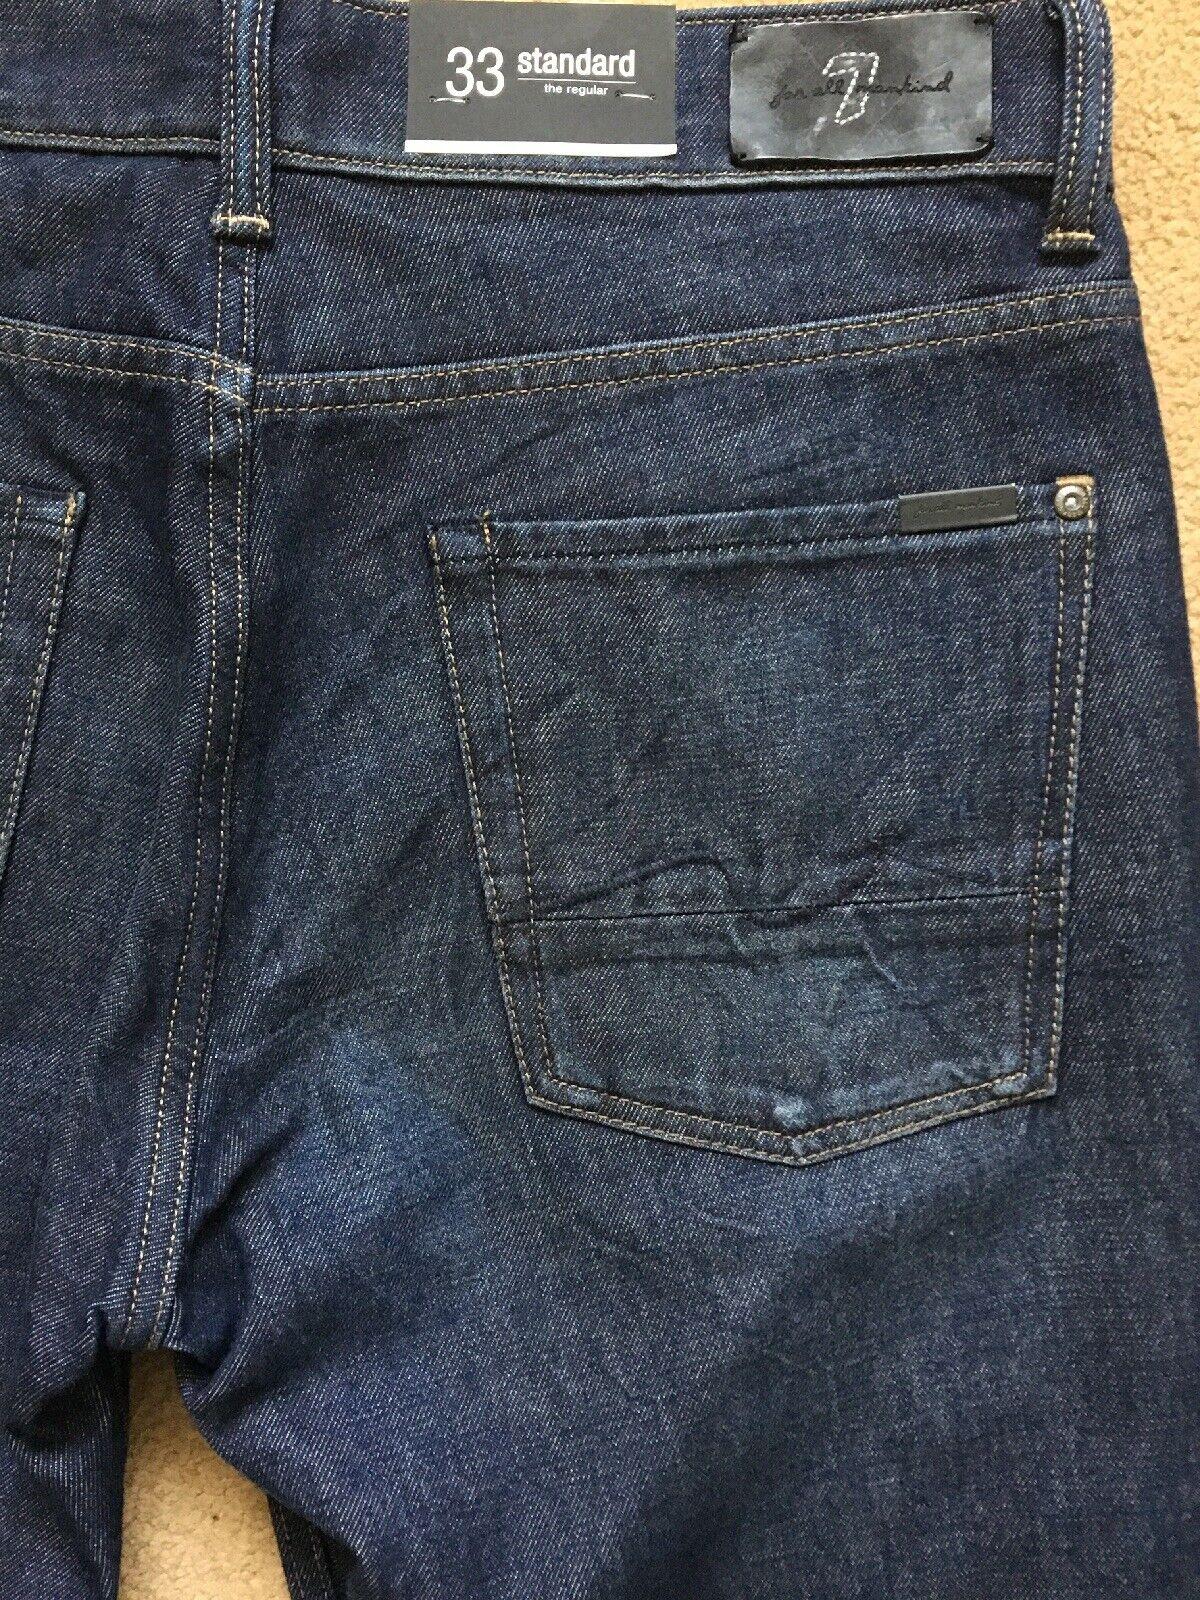 7 for All Mankind Uomo standard regolari-fit straight jeans jeans jeans blu, W33, L34, 6915a5